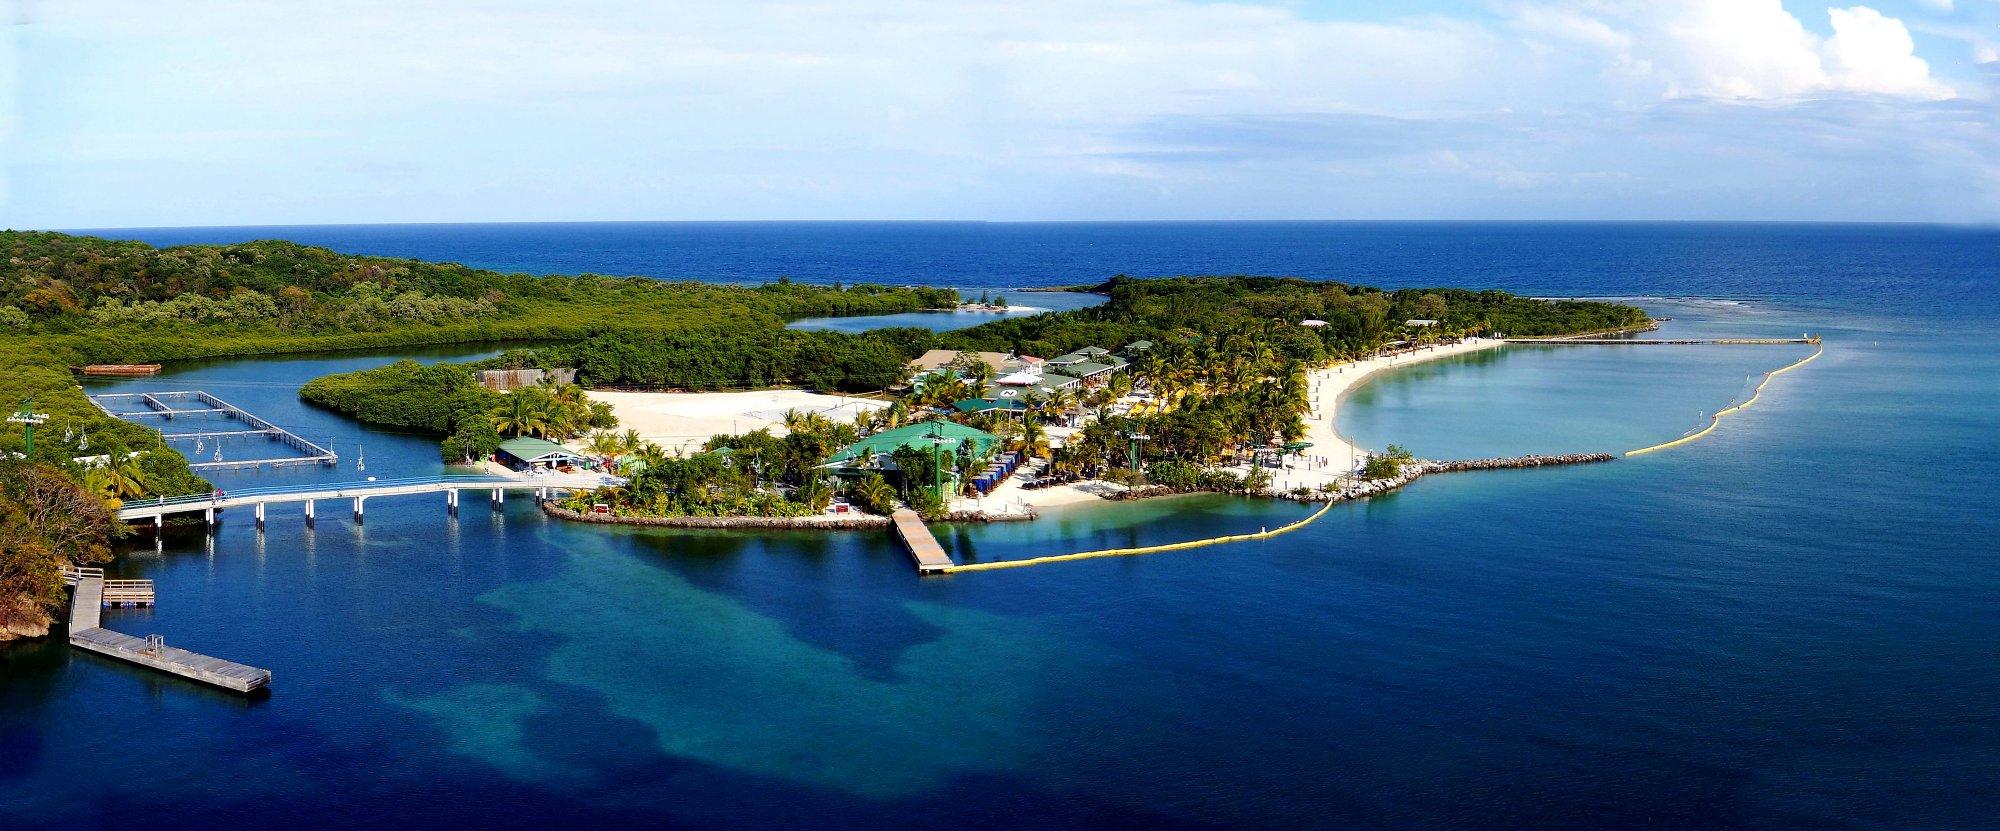 Mahogany Bay, Roatan Island, Honduras. Panorama. Fuji Finepix XP 200.DSCF_6481-6483.